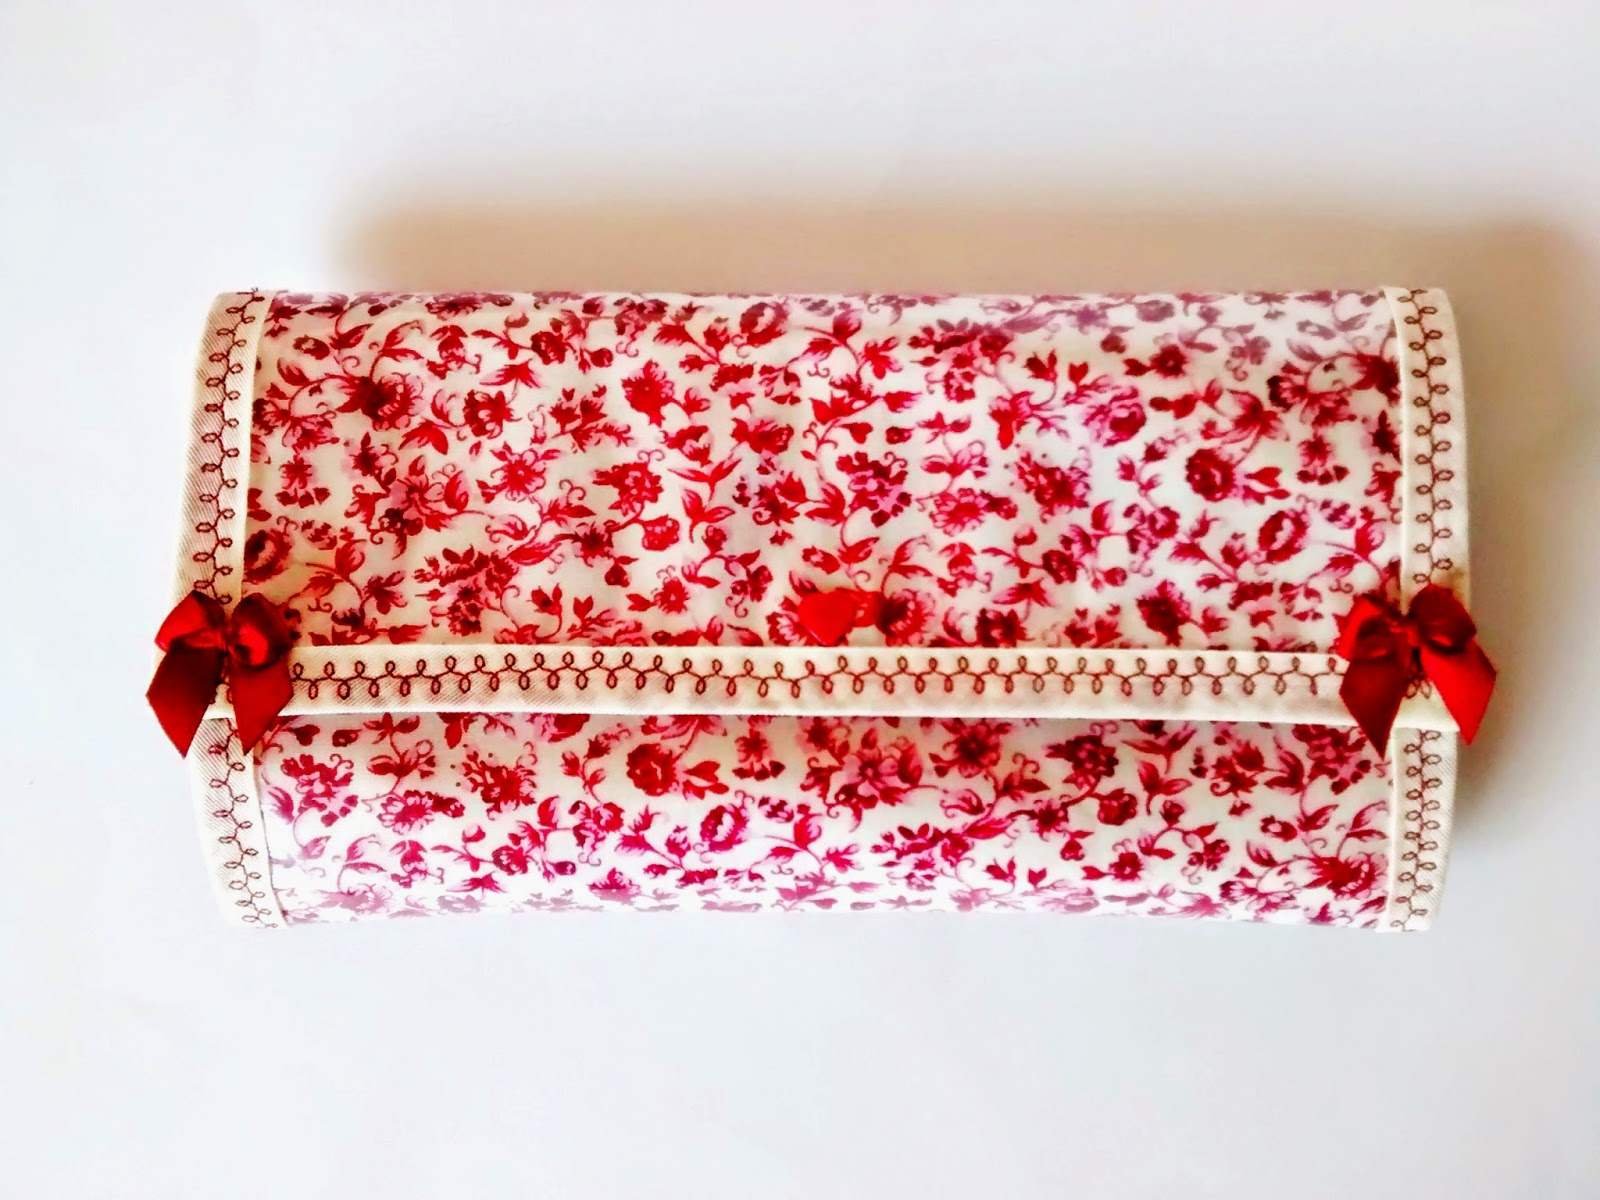 Kit higiene bucal estampa florzinha vermelha @ateliemadrica